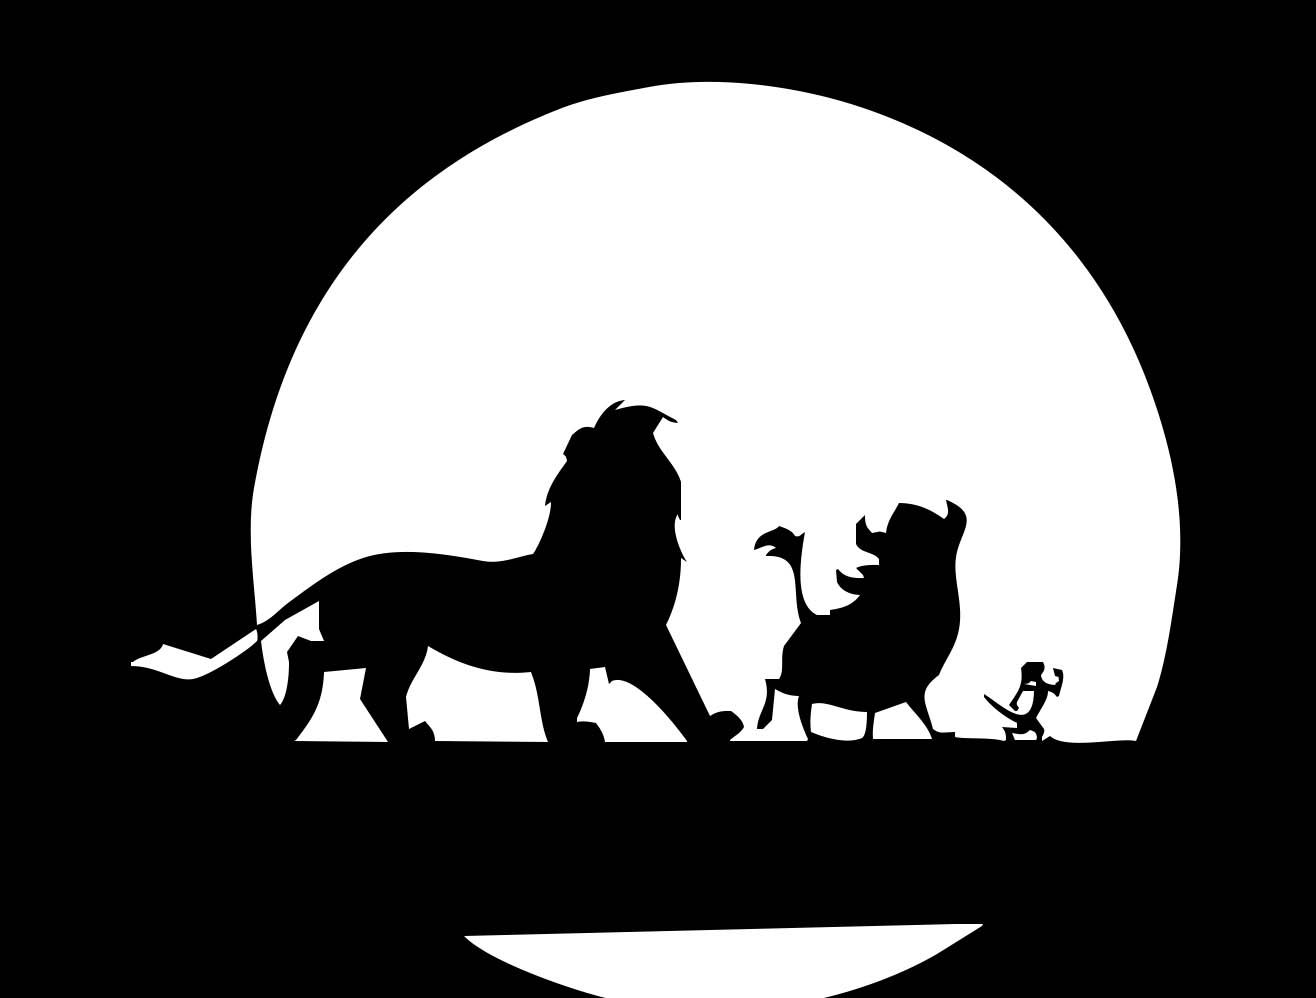 Custom Vinyl Decal Sticker Run Disney Hakuna Matata Lion King Simba Pumba Timon